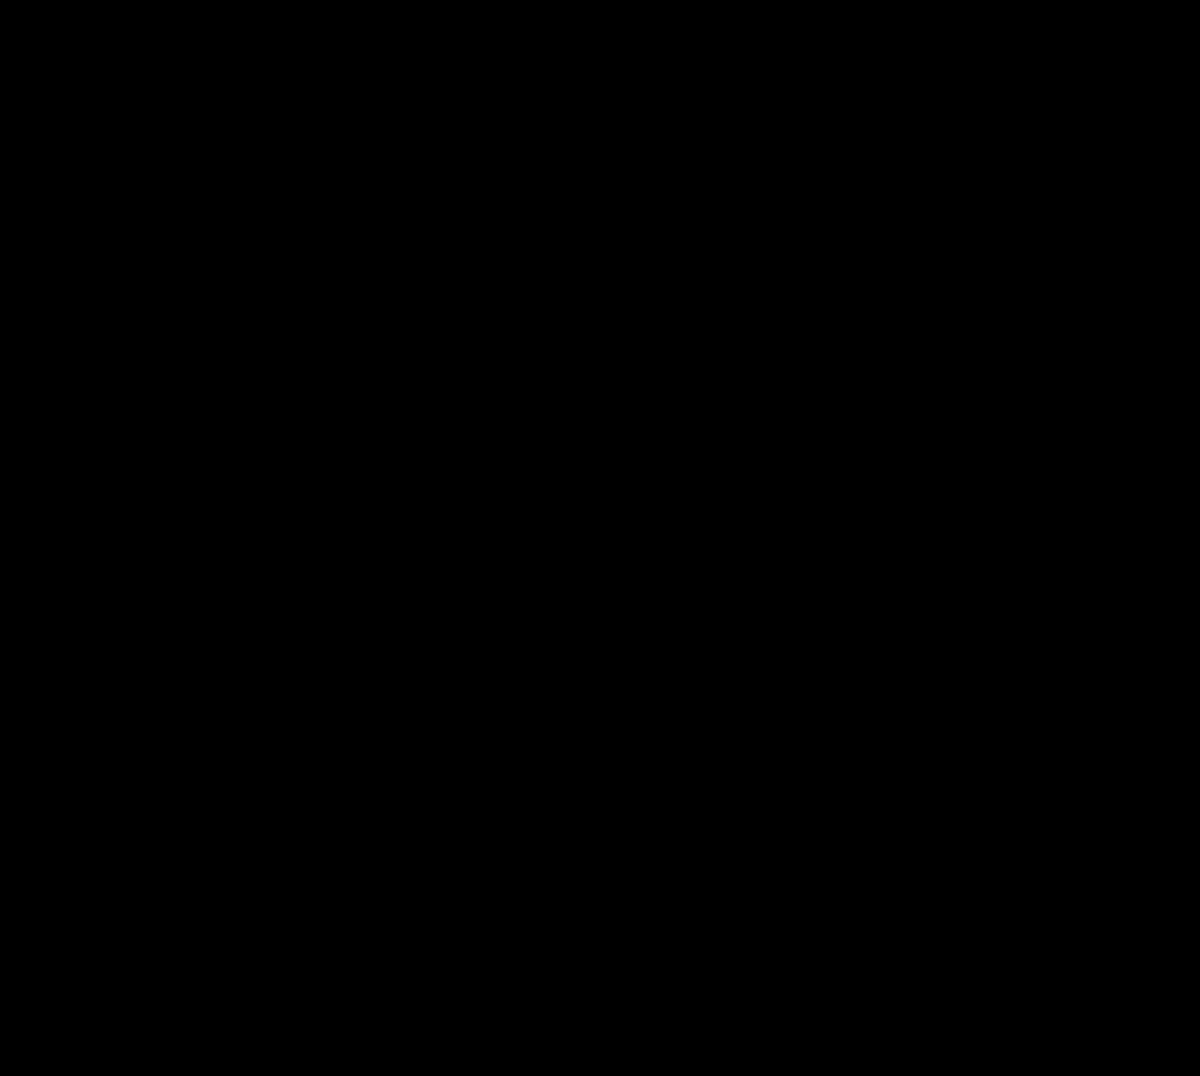 PopSockets Expanding Stand/Grip Split Figure